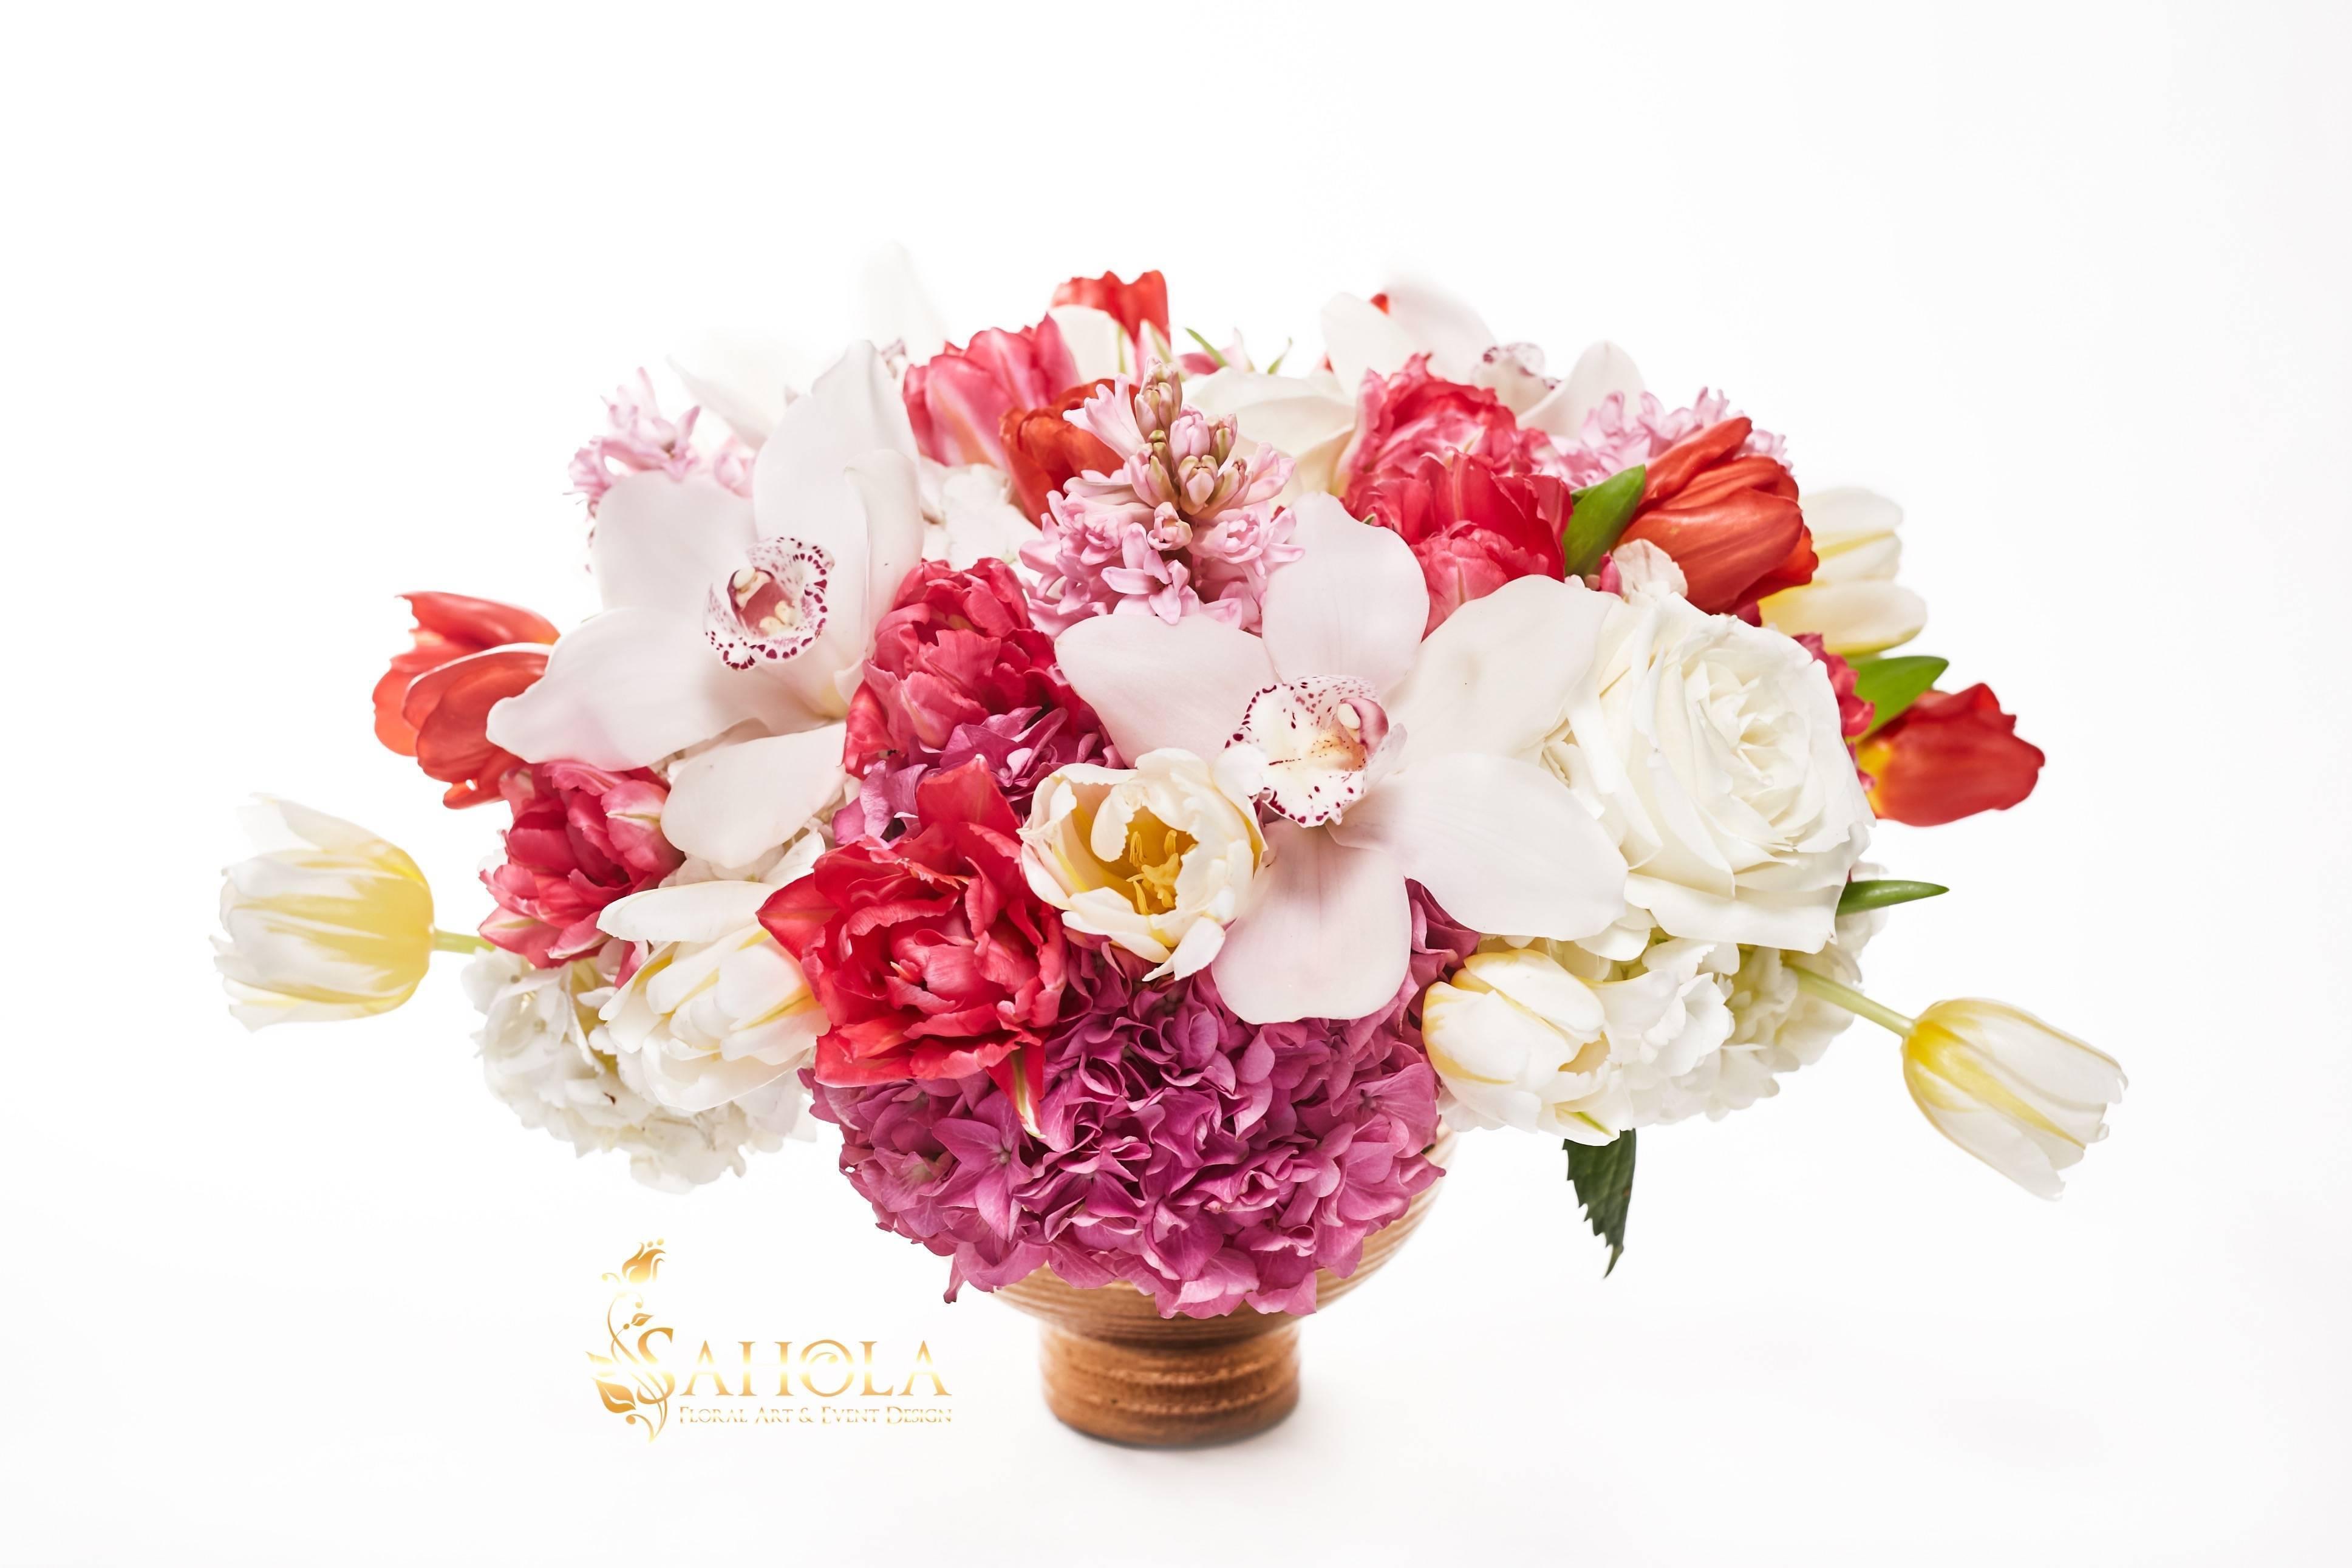 cf1e7acdce57119960db_11615c498065f3319f21_Romantic_sunrise__sahola_flowers.jpg